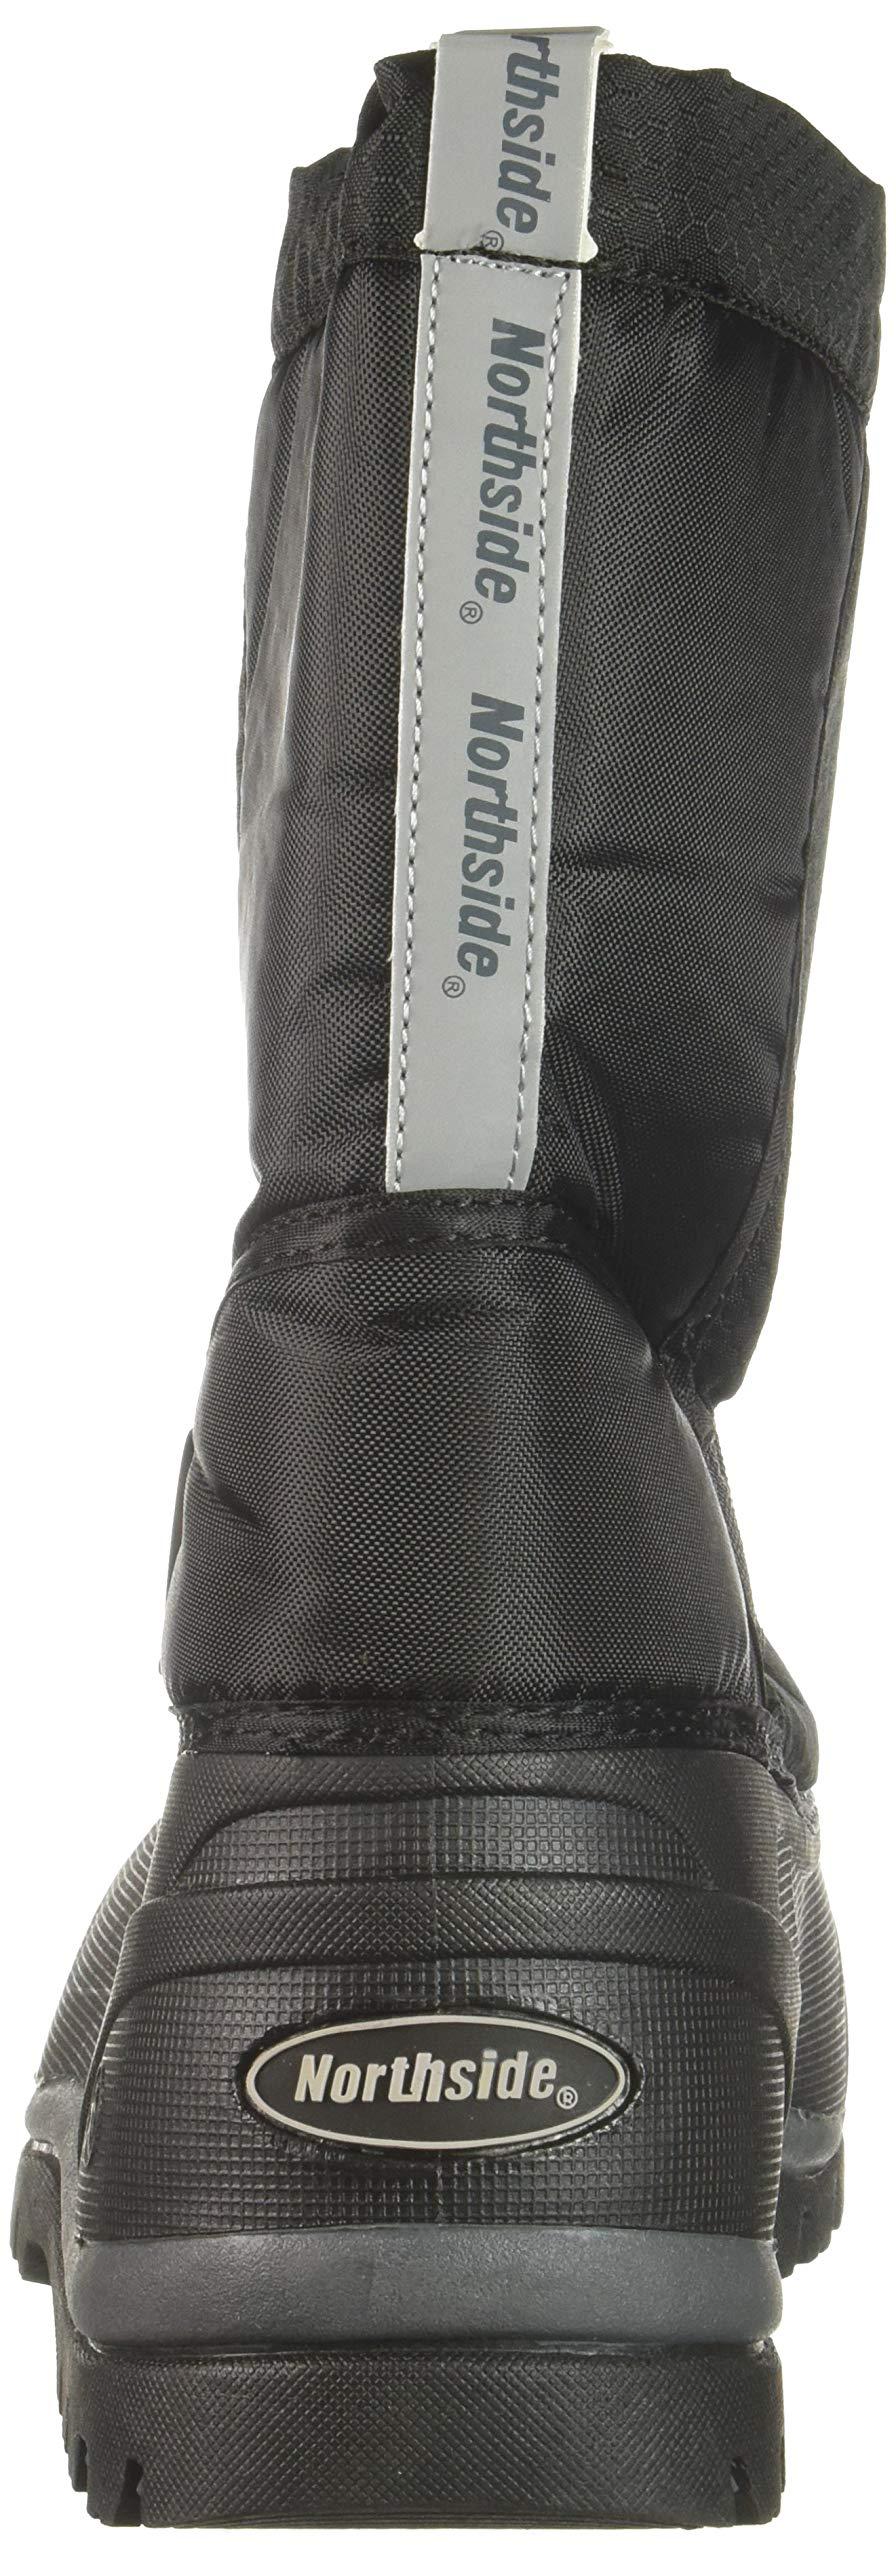 Northside Zephyr Snow Boot, Onyx, 6 Medium US Big Kid by Northside (Image #2)